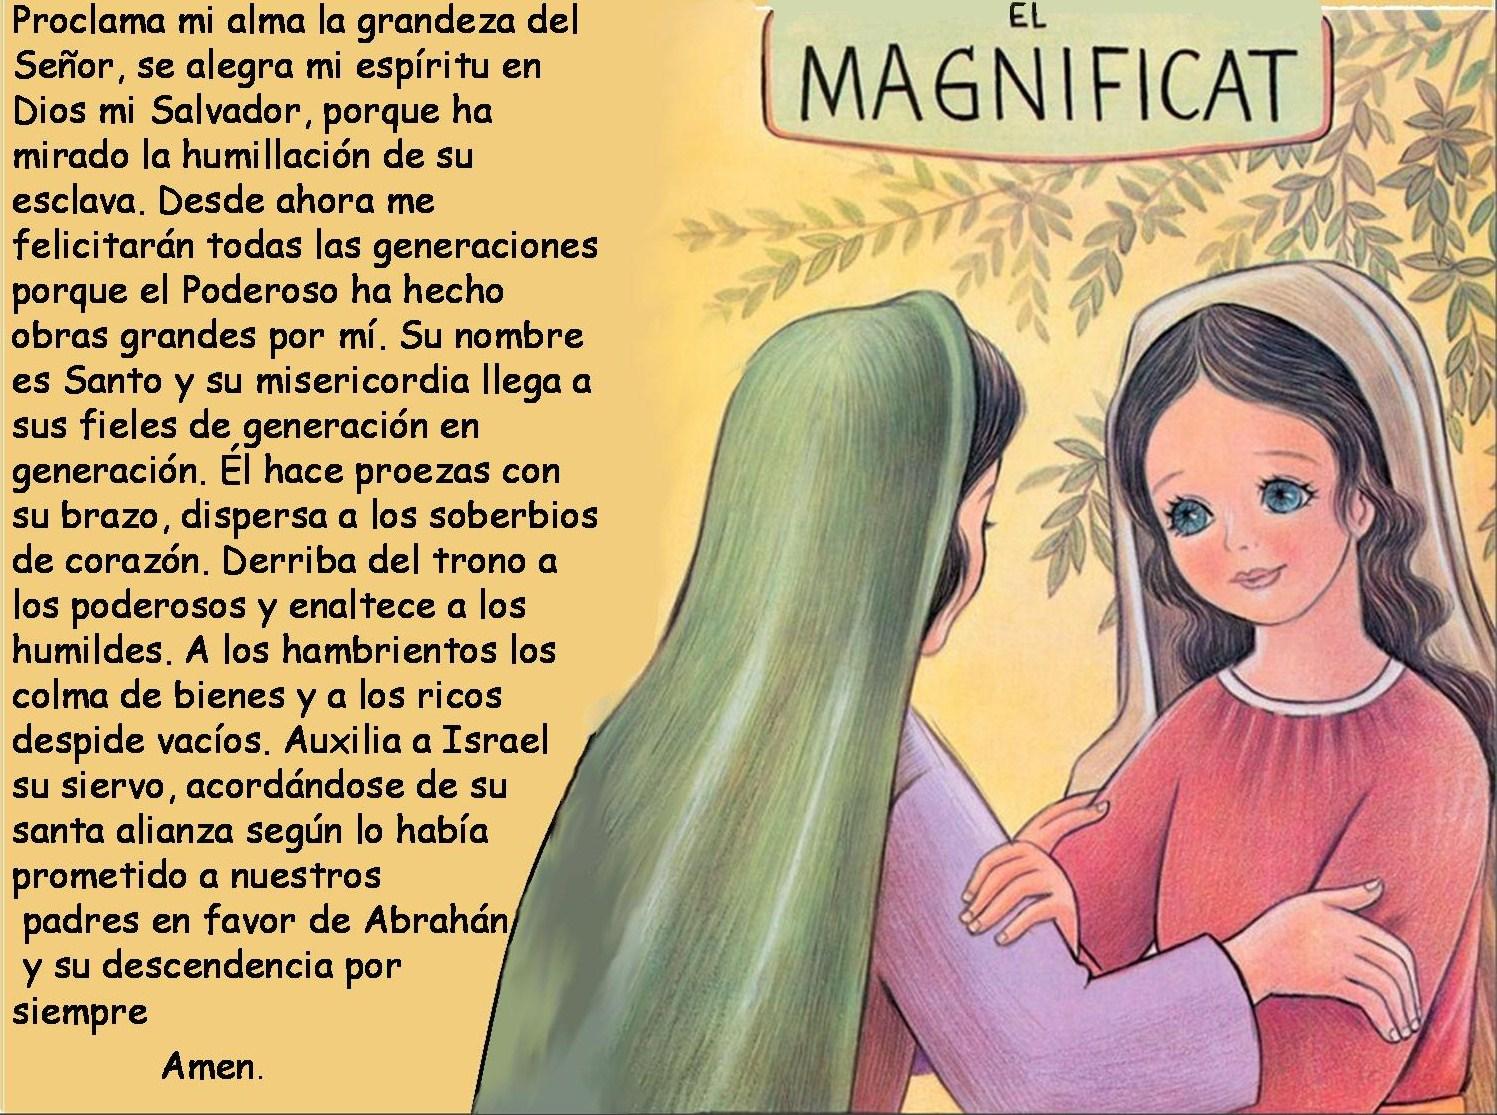 http://monaguillosdelaasuncion.files.wordpress.com/2011/02/magnificat.jpg